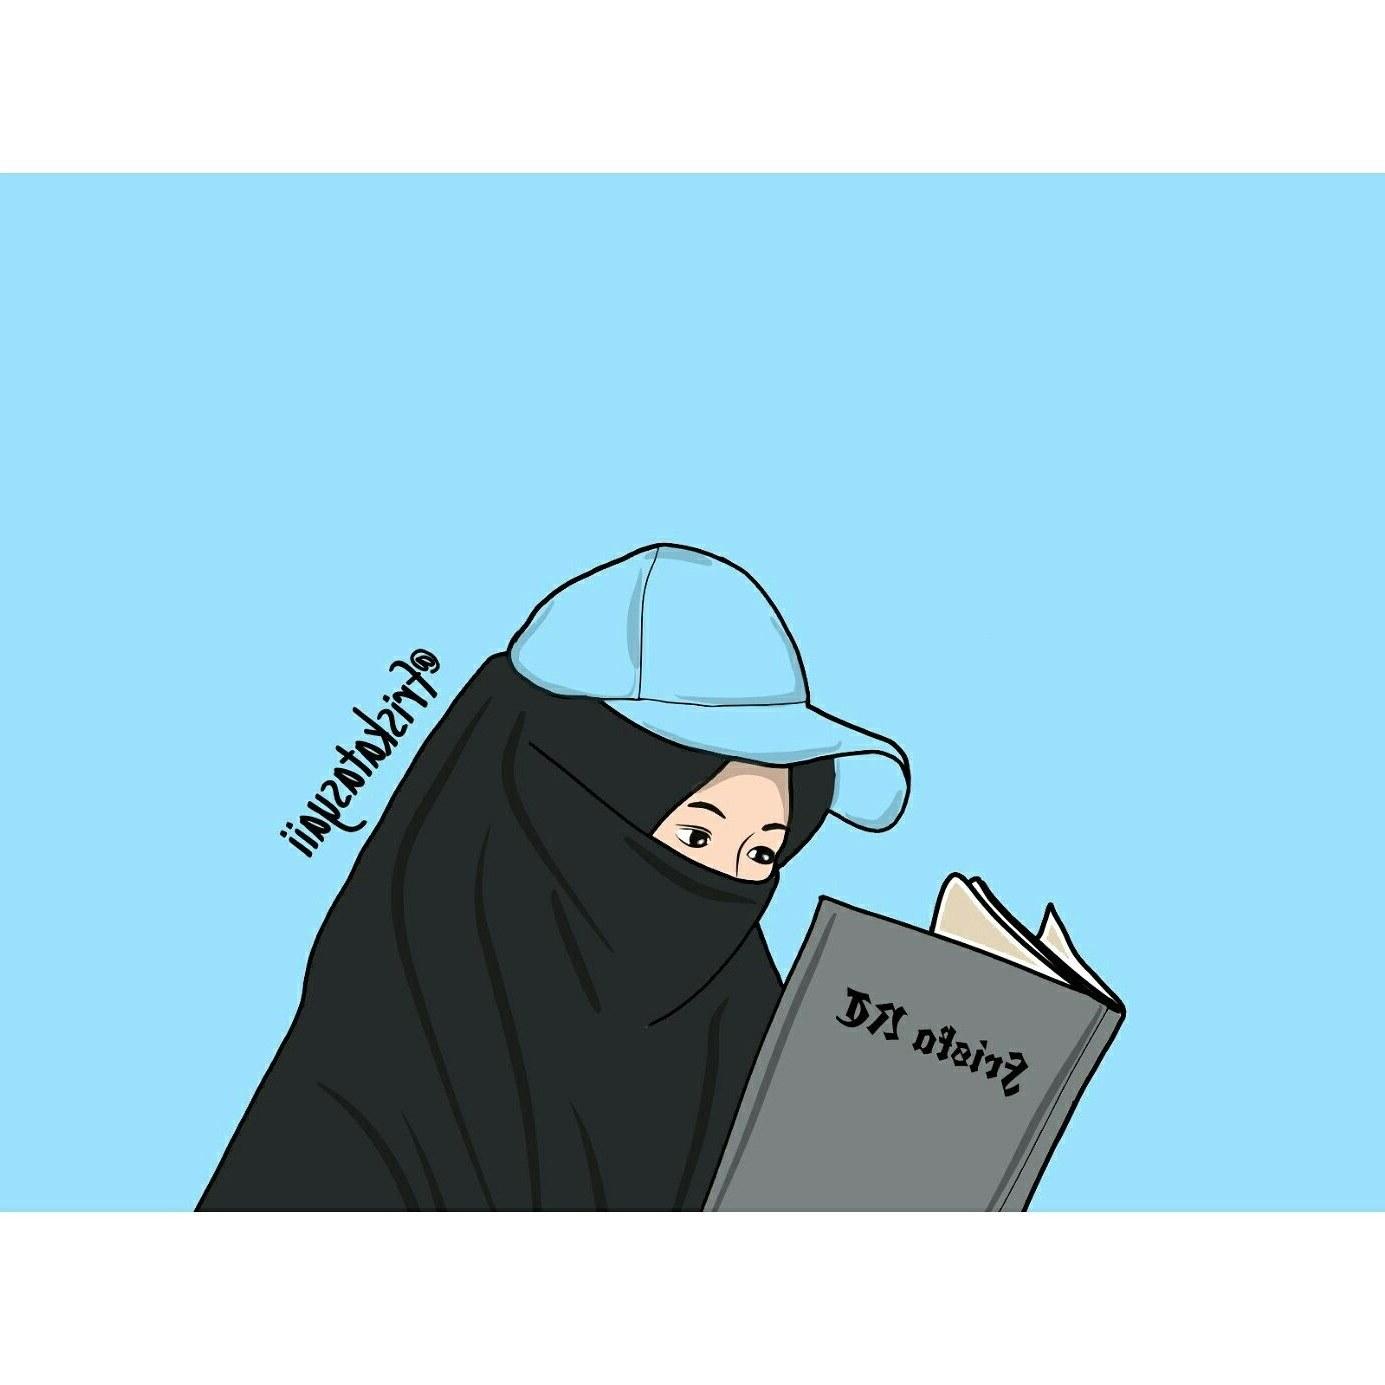 Inspirasi Muslimah Kartun Cantik Gdd0 Gambar Kartun Muslimah Modern Cari Gambar Keren Hd